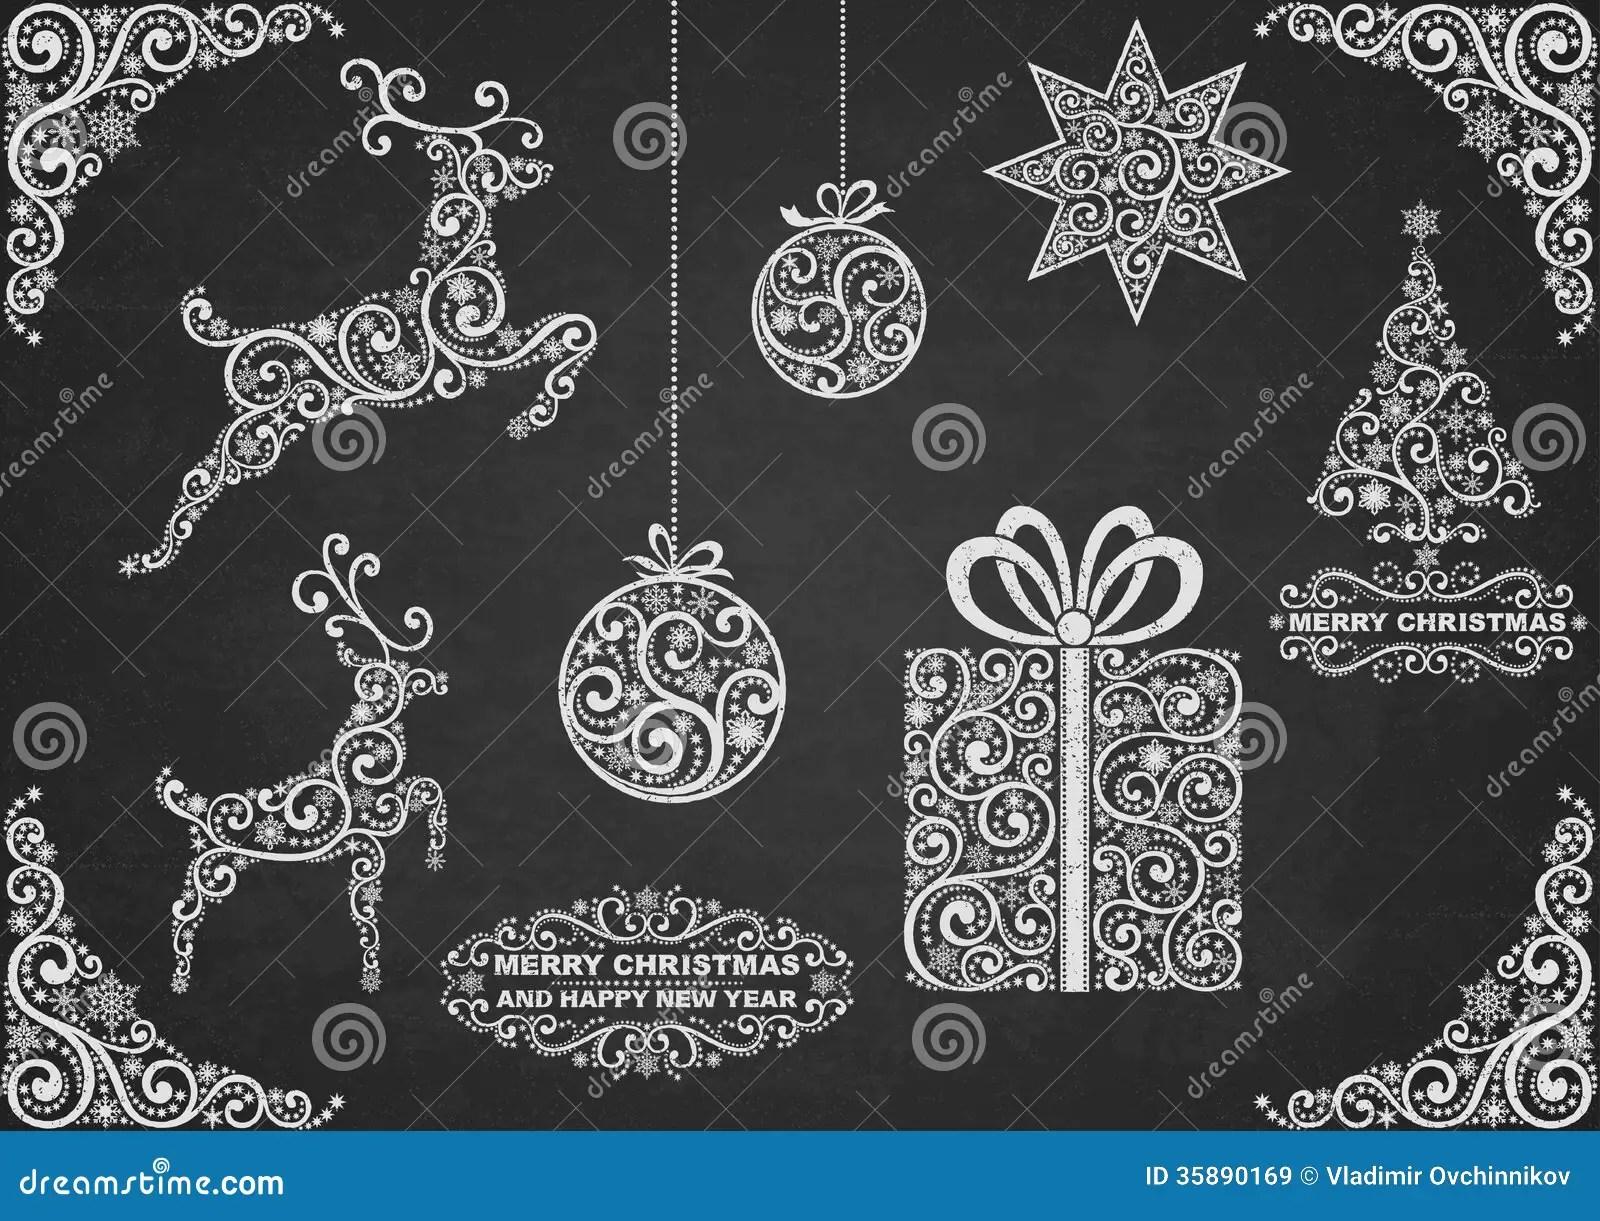 Christmas Symbols Chalkboard Stock Vector Image 35890169